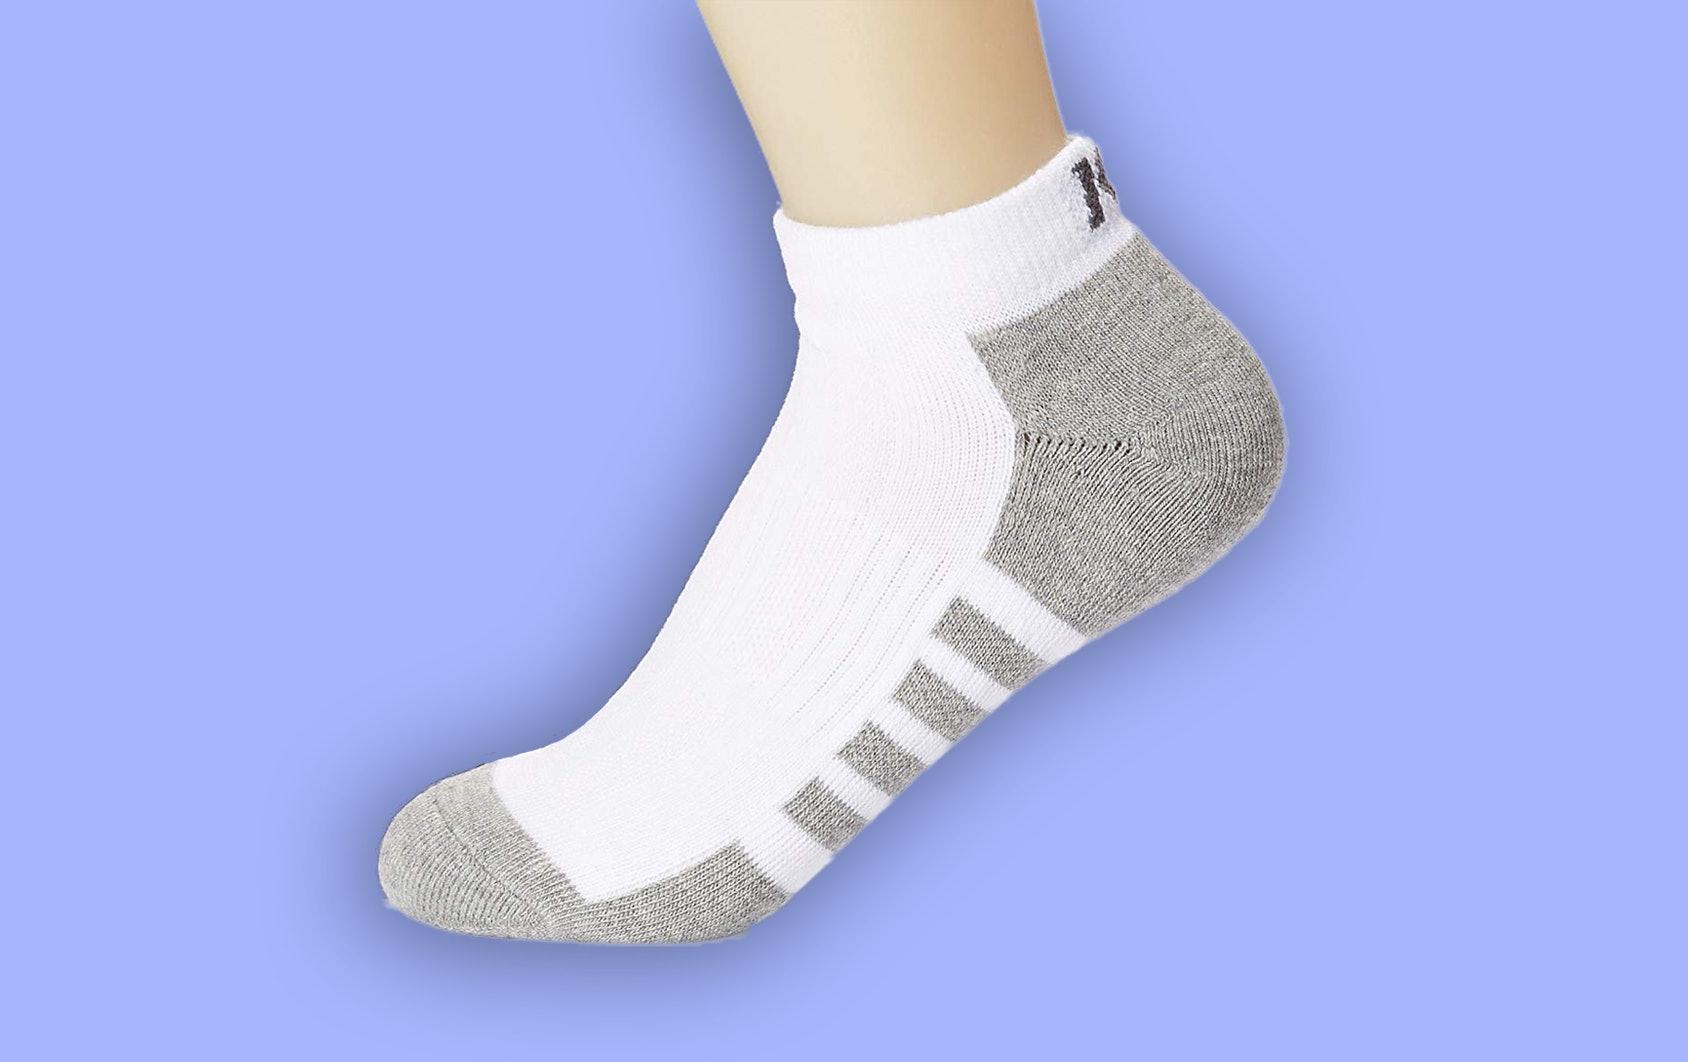 Double thick bottom socks